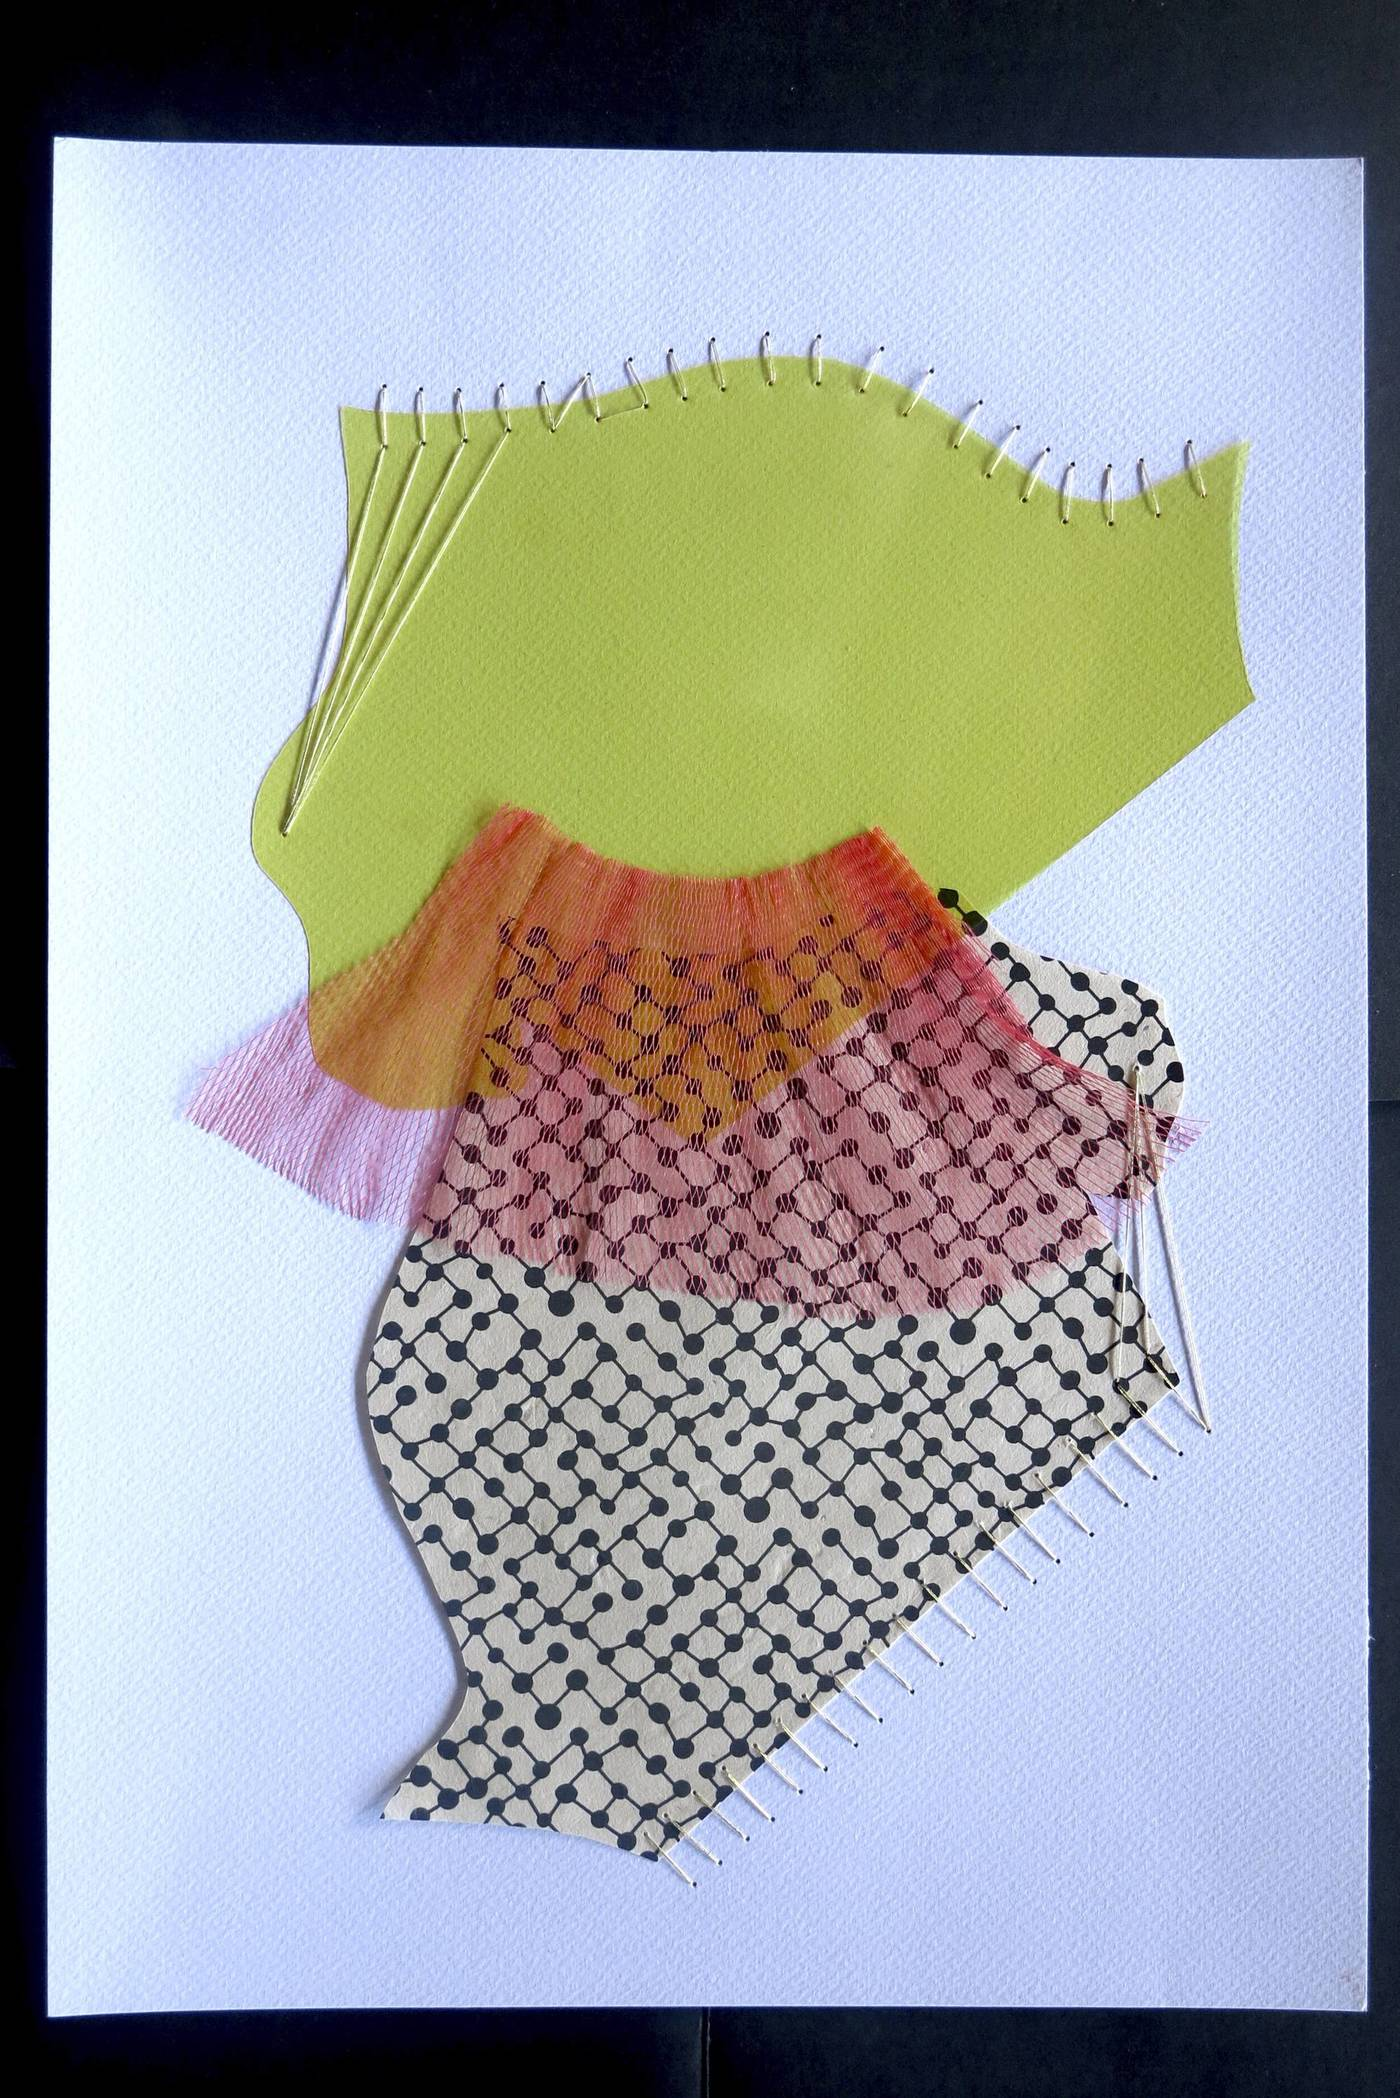 Maliza Kiasuwa, A Little Red, 2021 Collage, thread and Washi paper 18 x 14 in Courtesy of the artist and Morton Fine Art